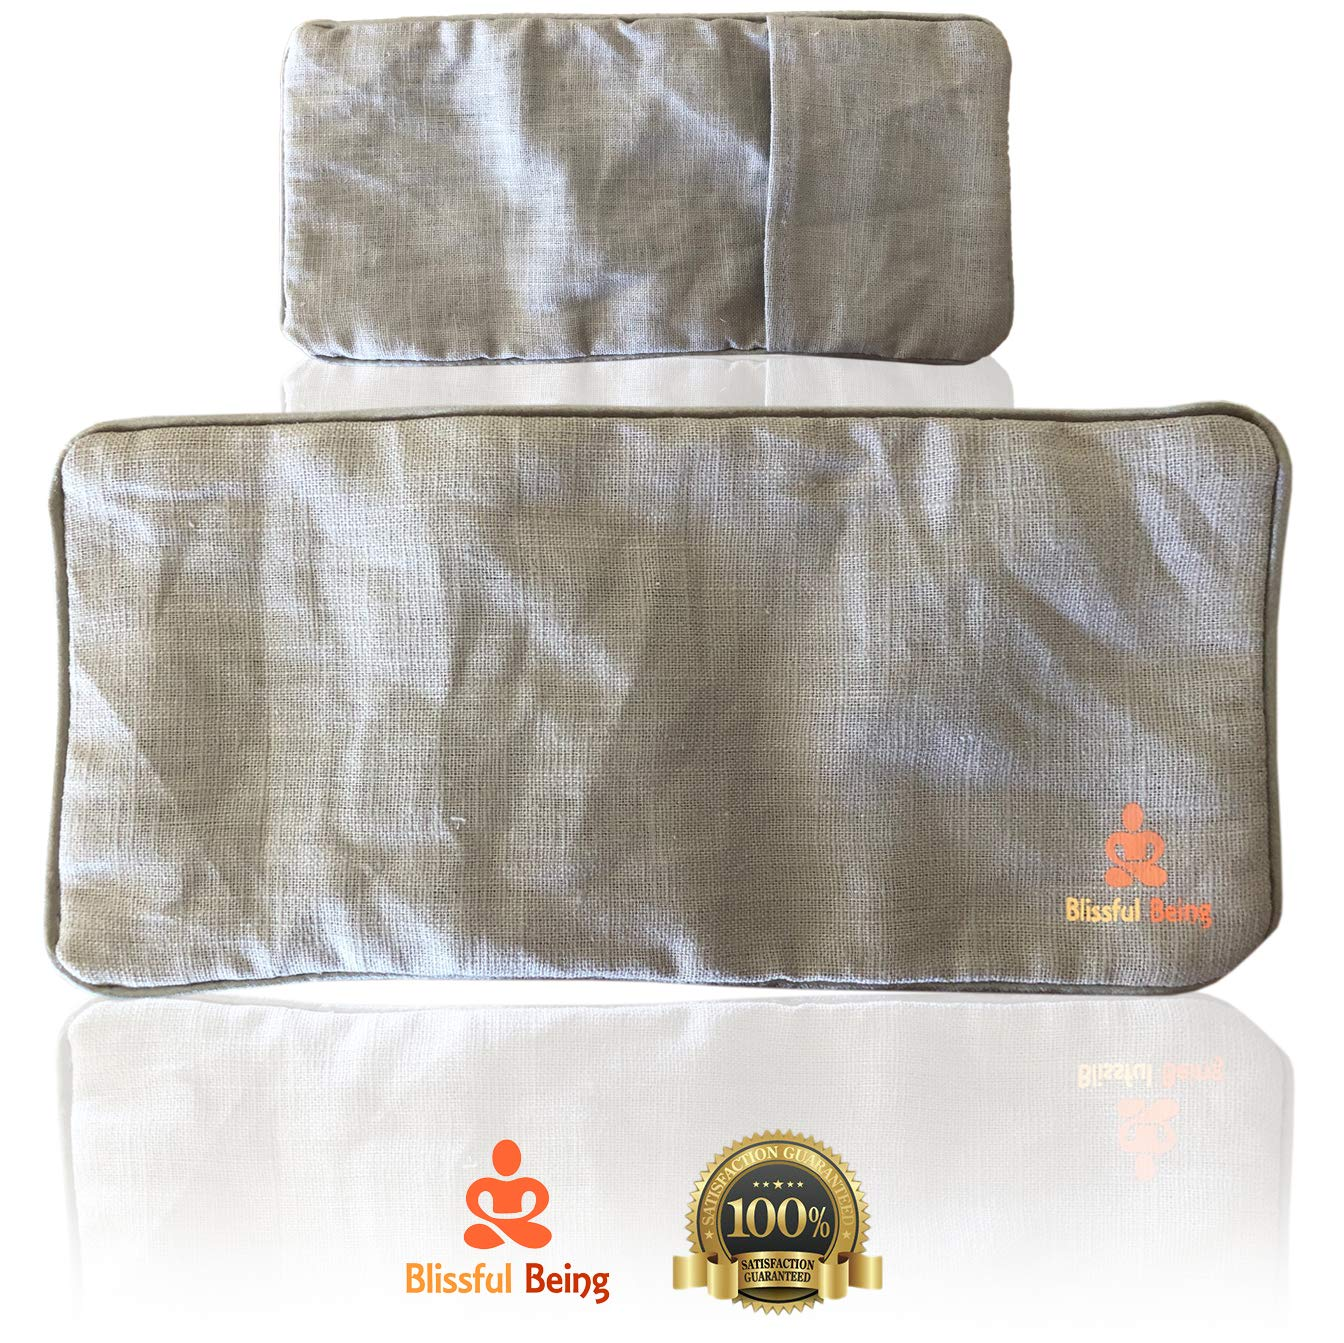 Amazon.com: Blissful Being Namaste - Almohada para yoga y ...